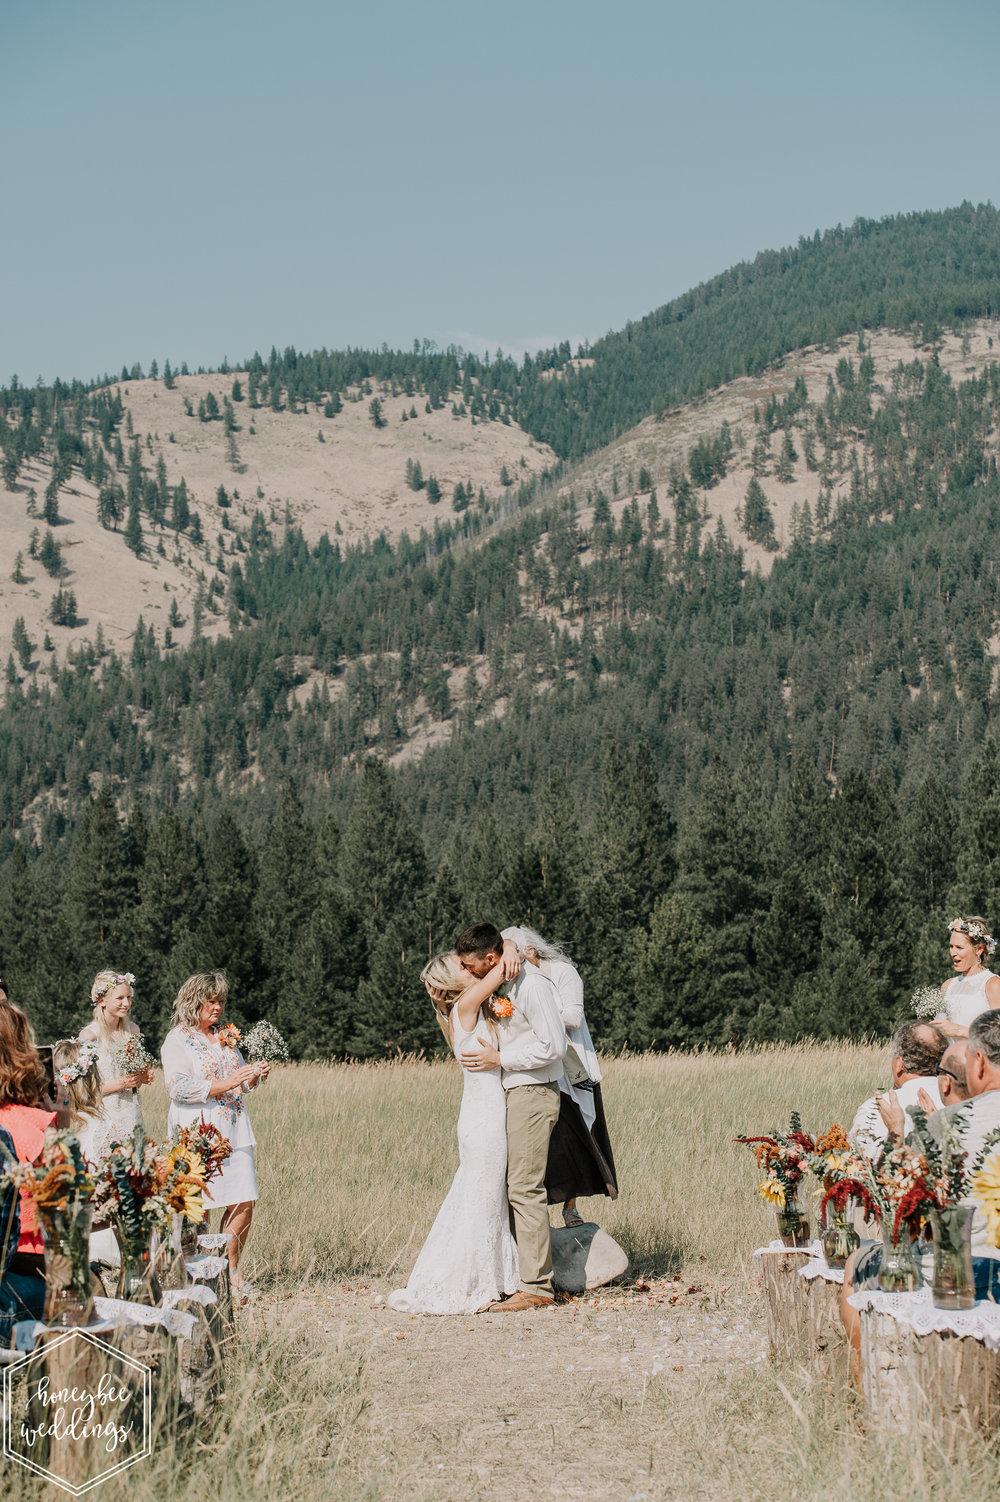 0378Alberton Wedding_Montana Wedding Photographer_Anneliesa Bashaw + Wyatt Zeylawy_August 11, 2018-284.jpg